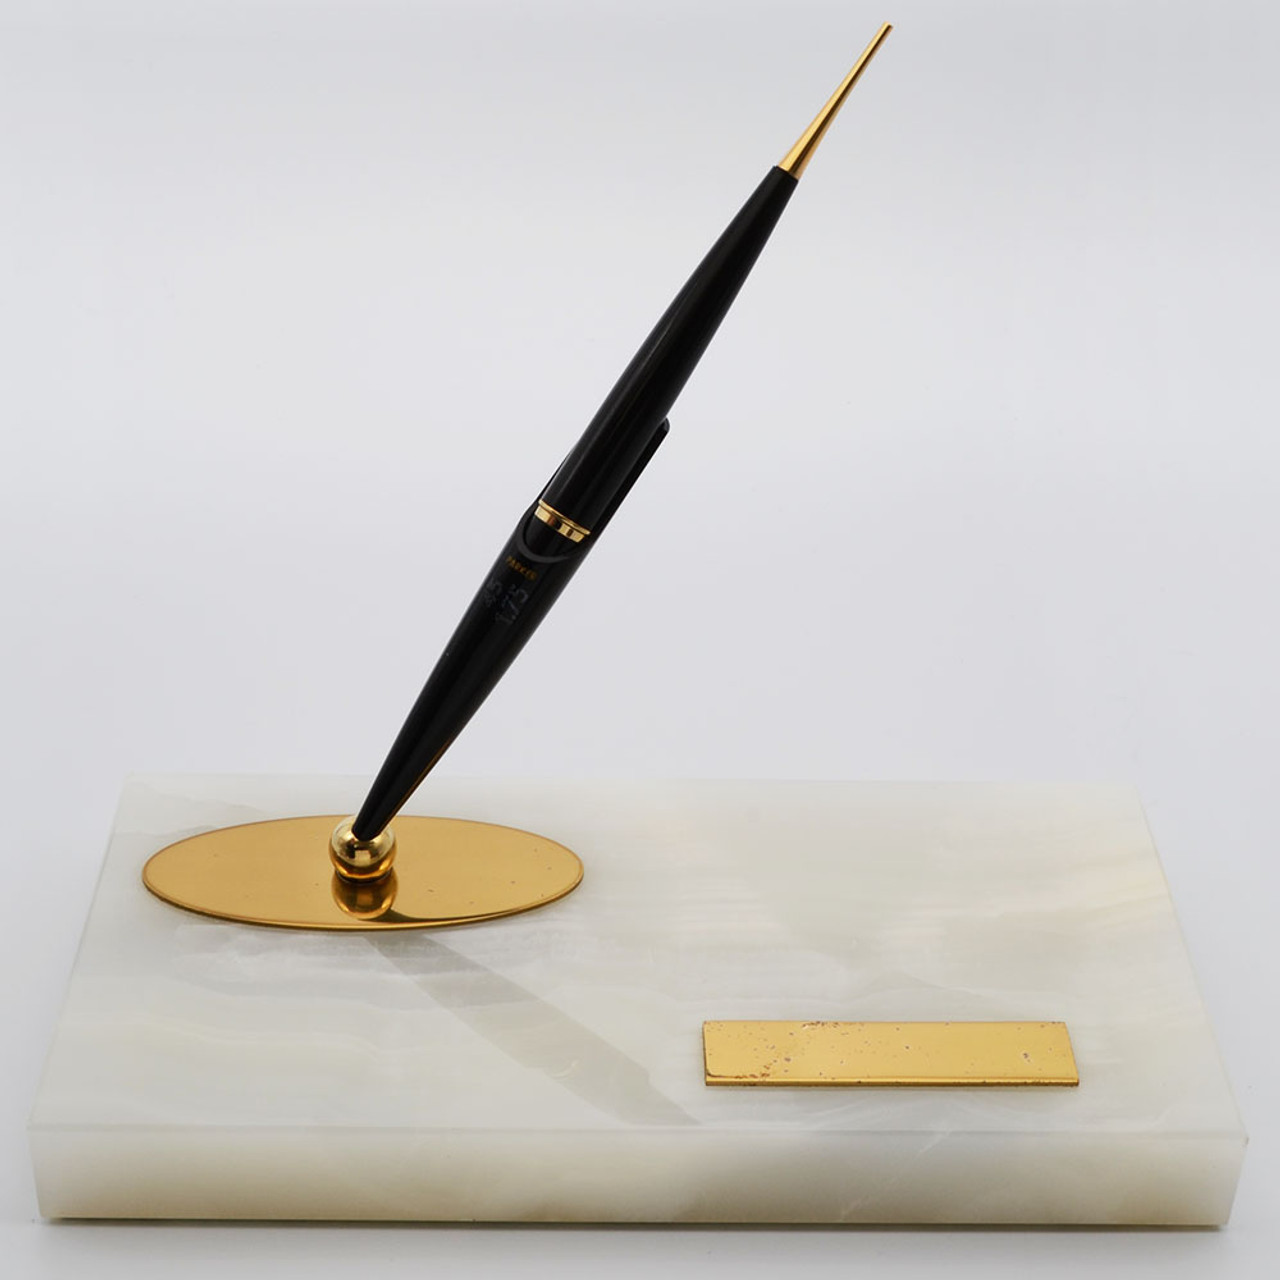 Fountain Pen Desk Set by Wahl Oxford 14K Nib Onyx Base